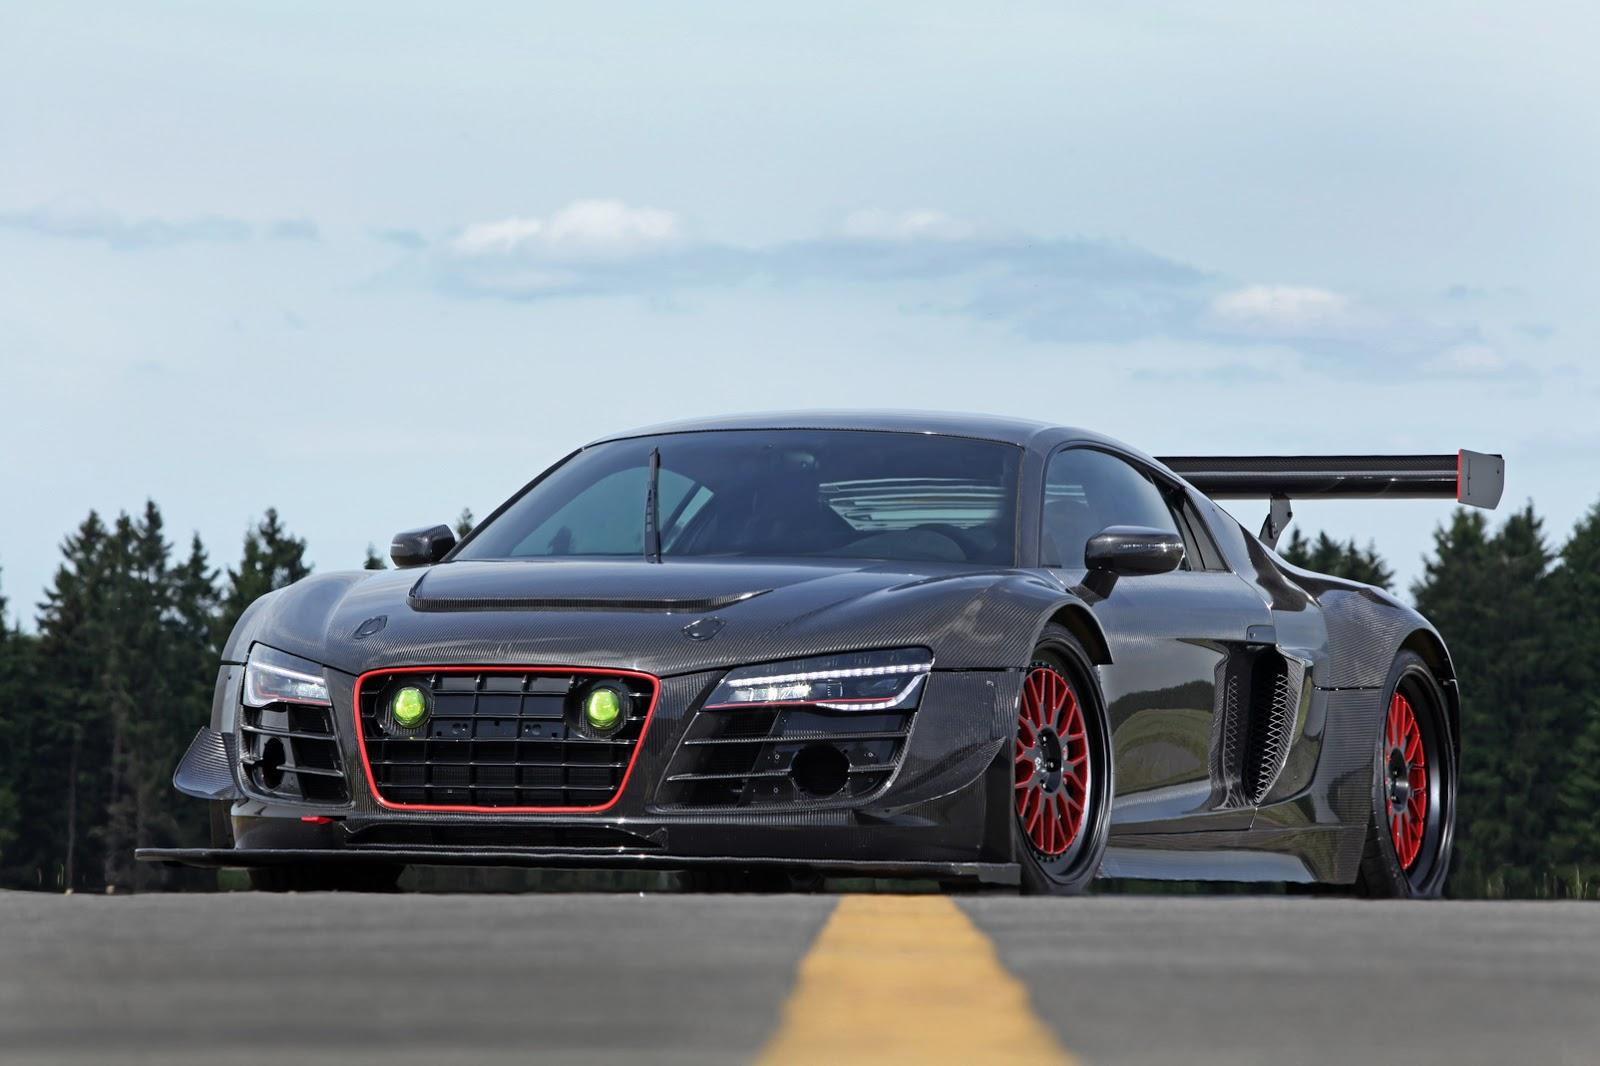 Audi-R8-Recon-MR8-4.jpg